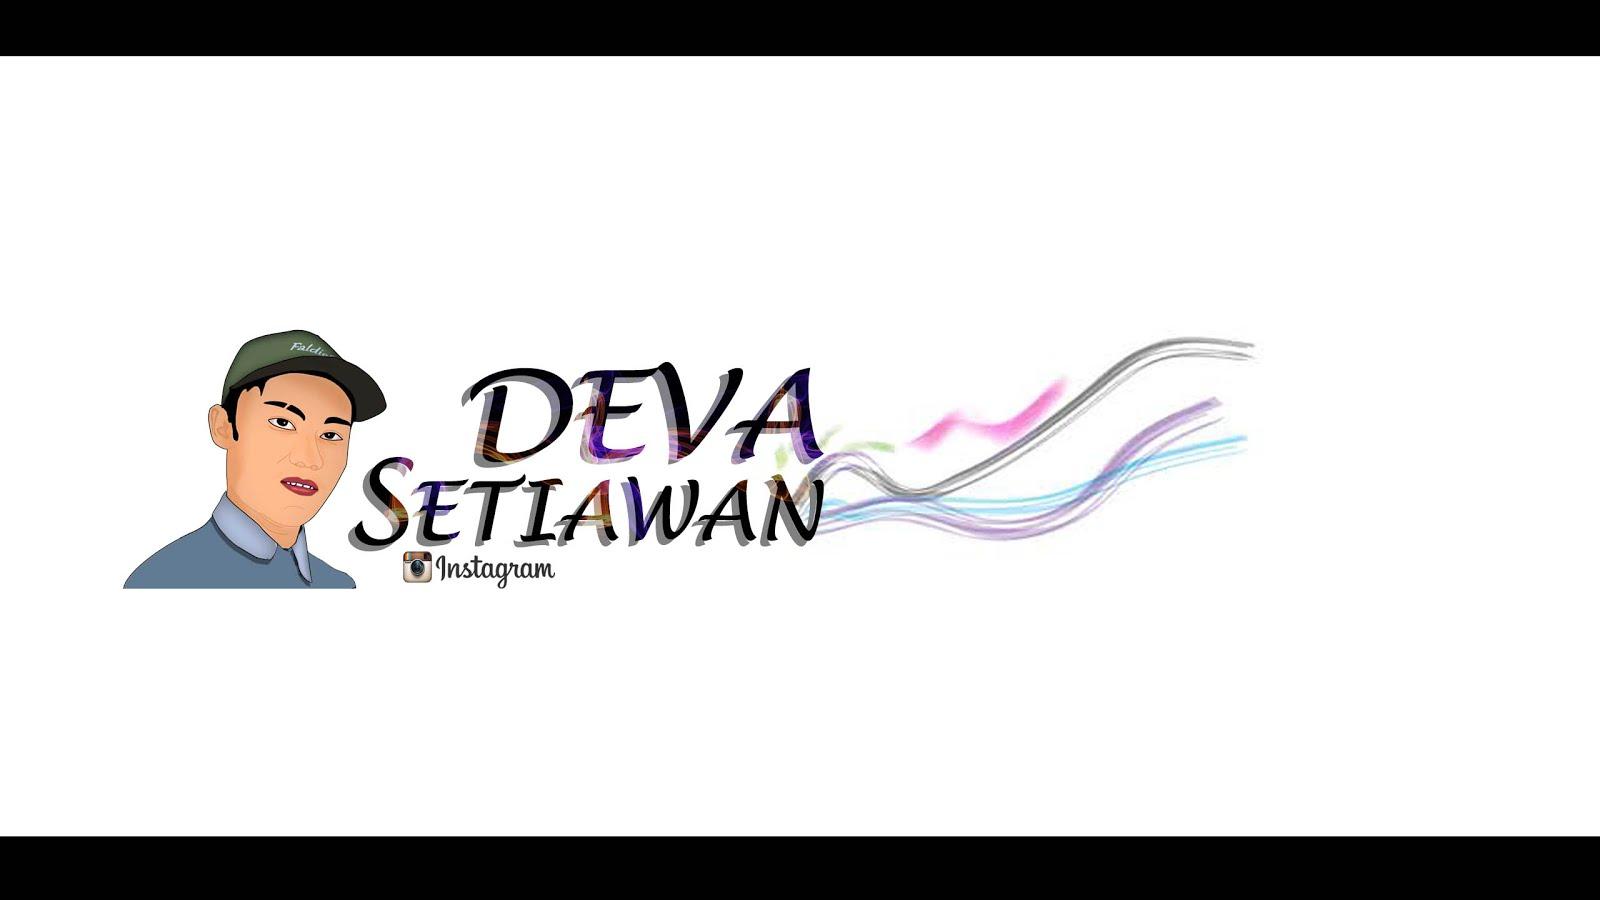 Deva Setiawan VFX